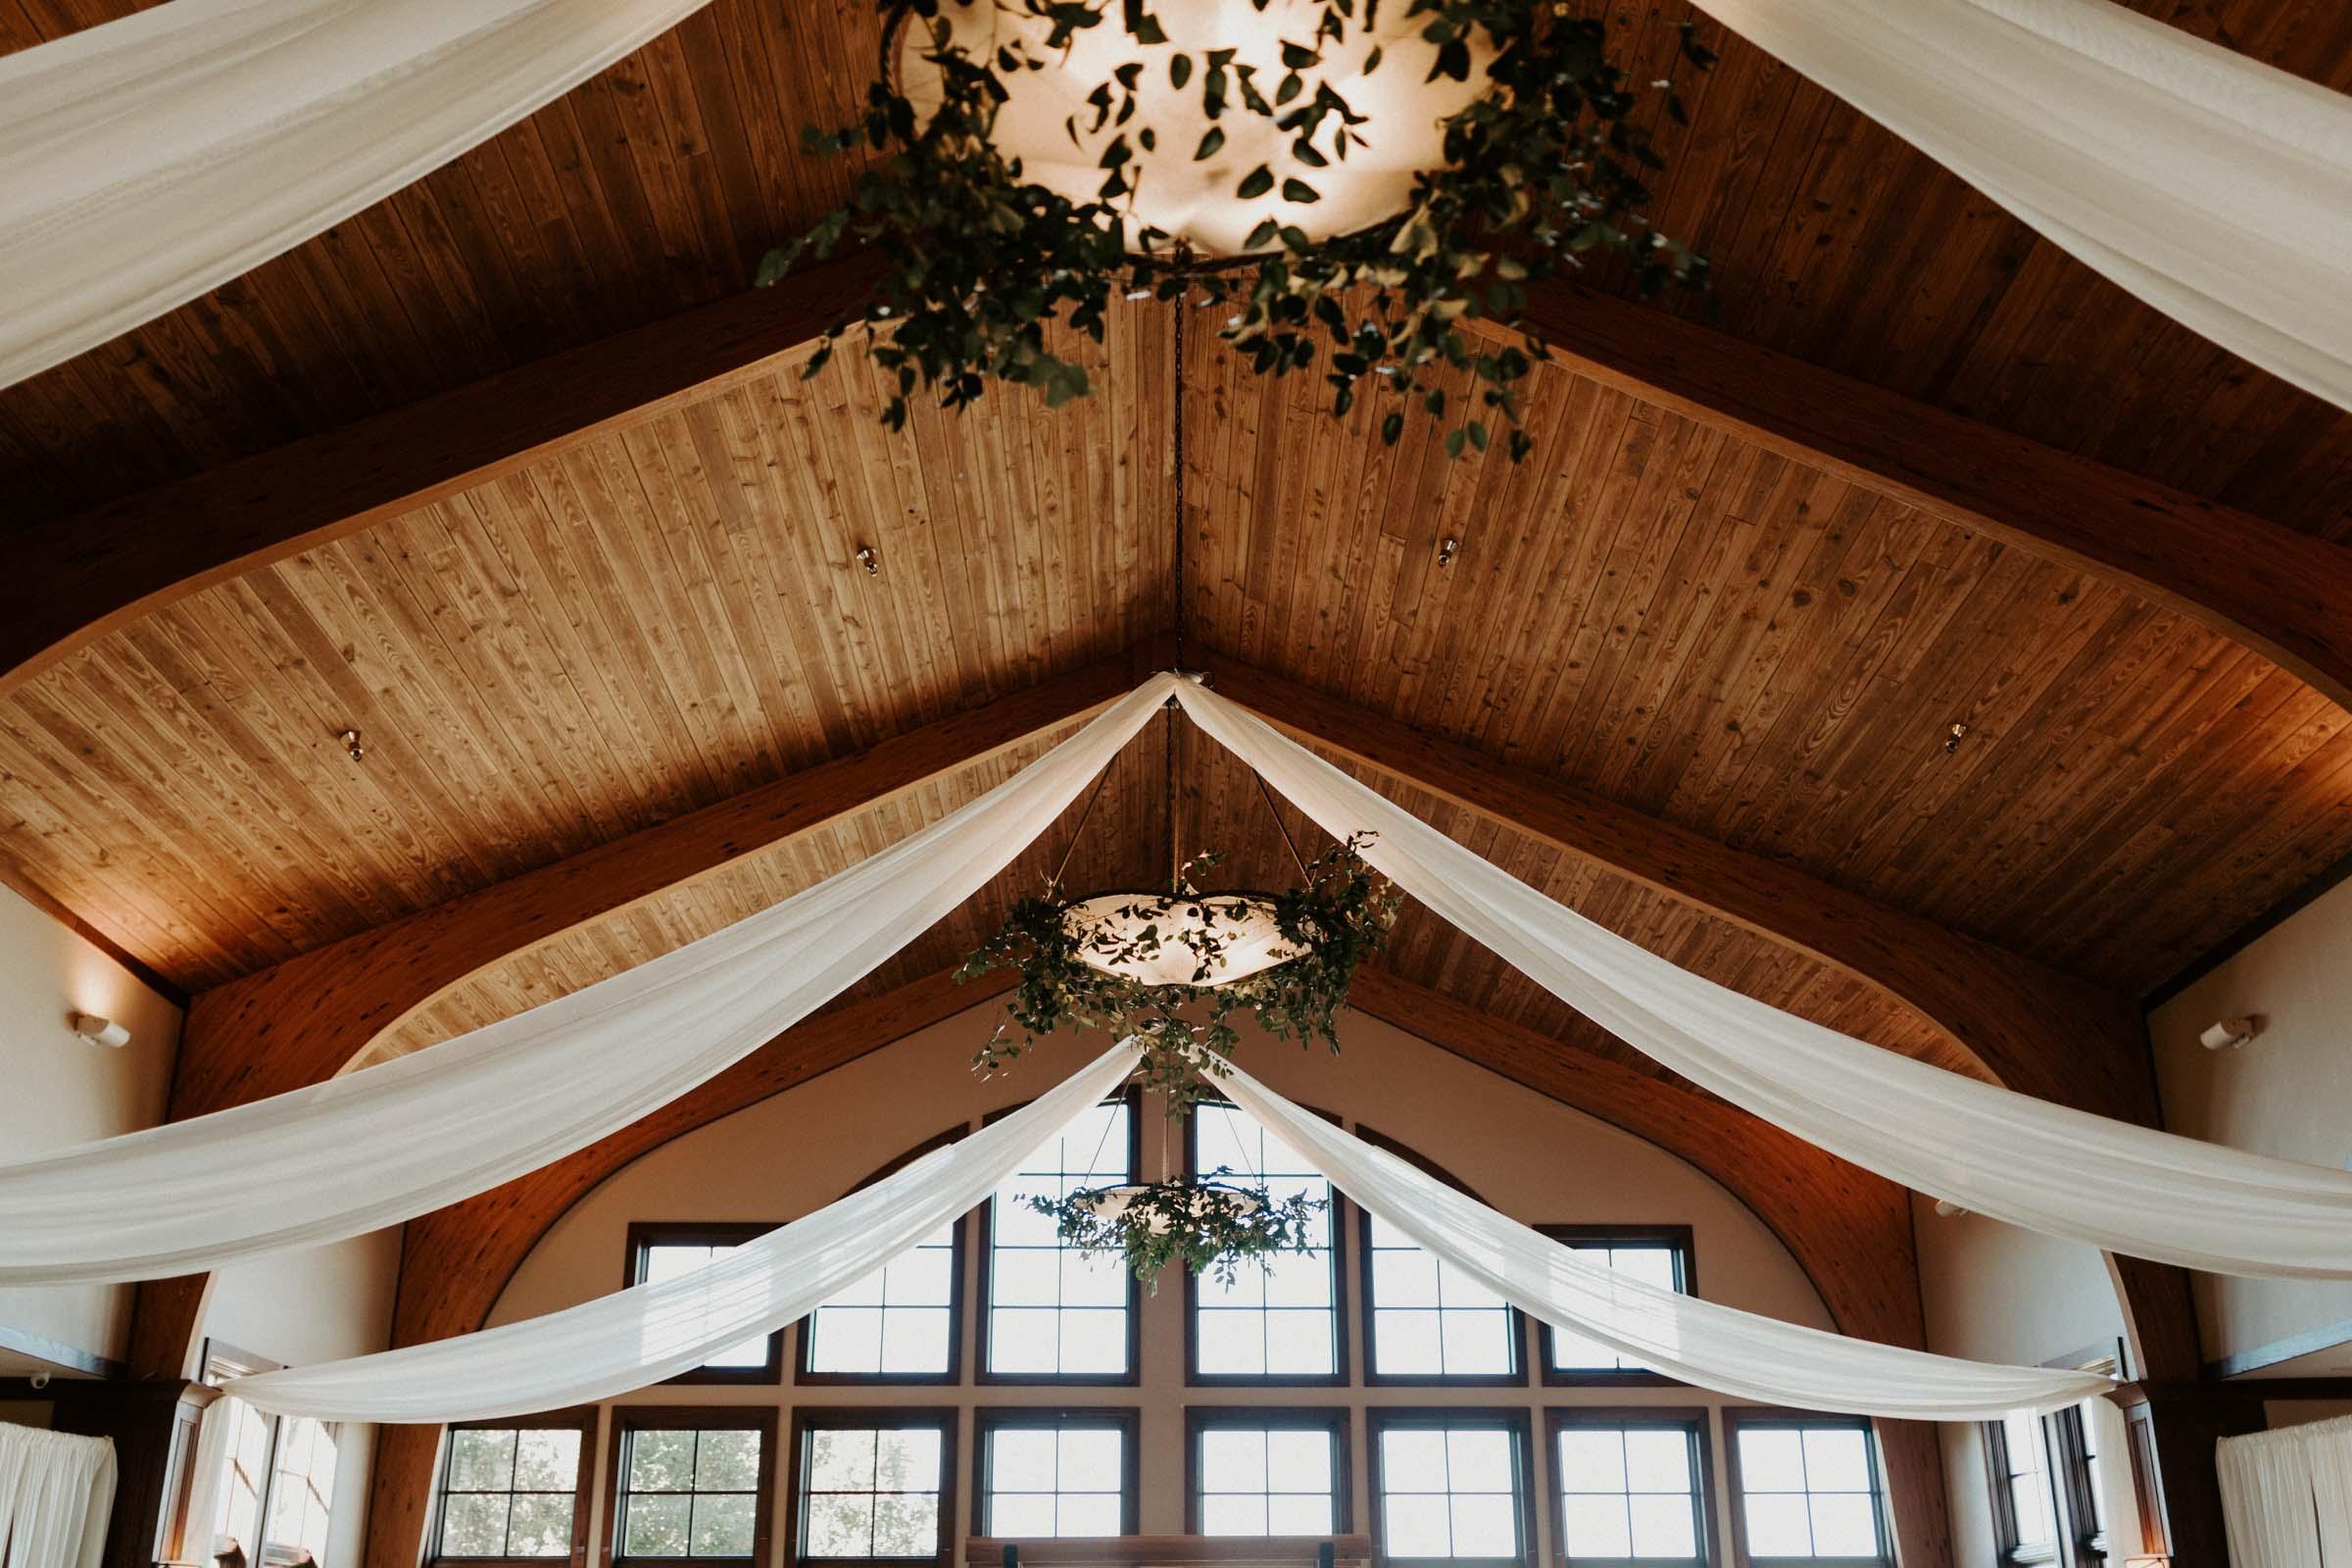 Stunning wedding venue decor space